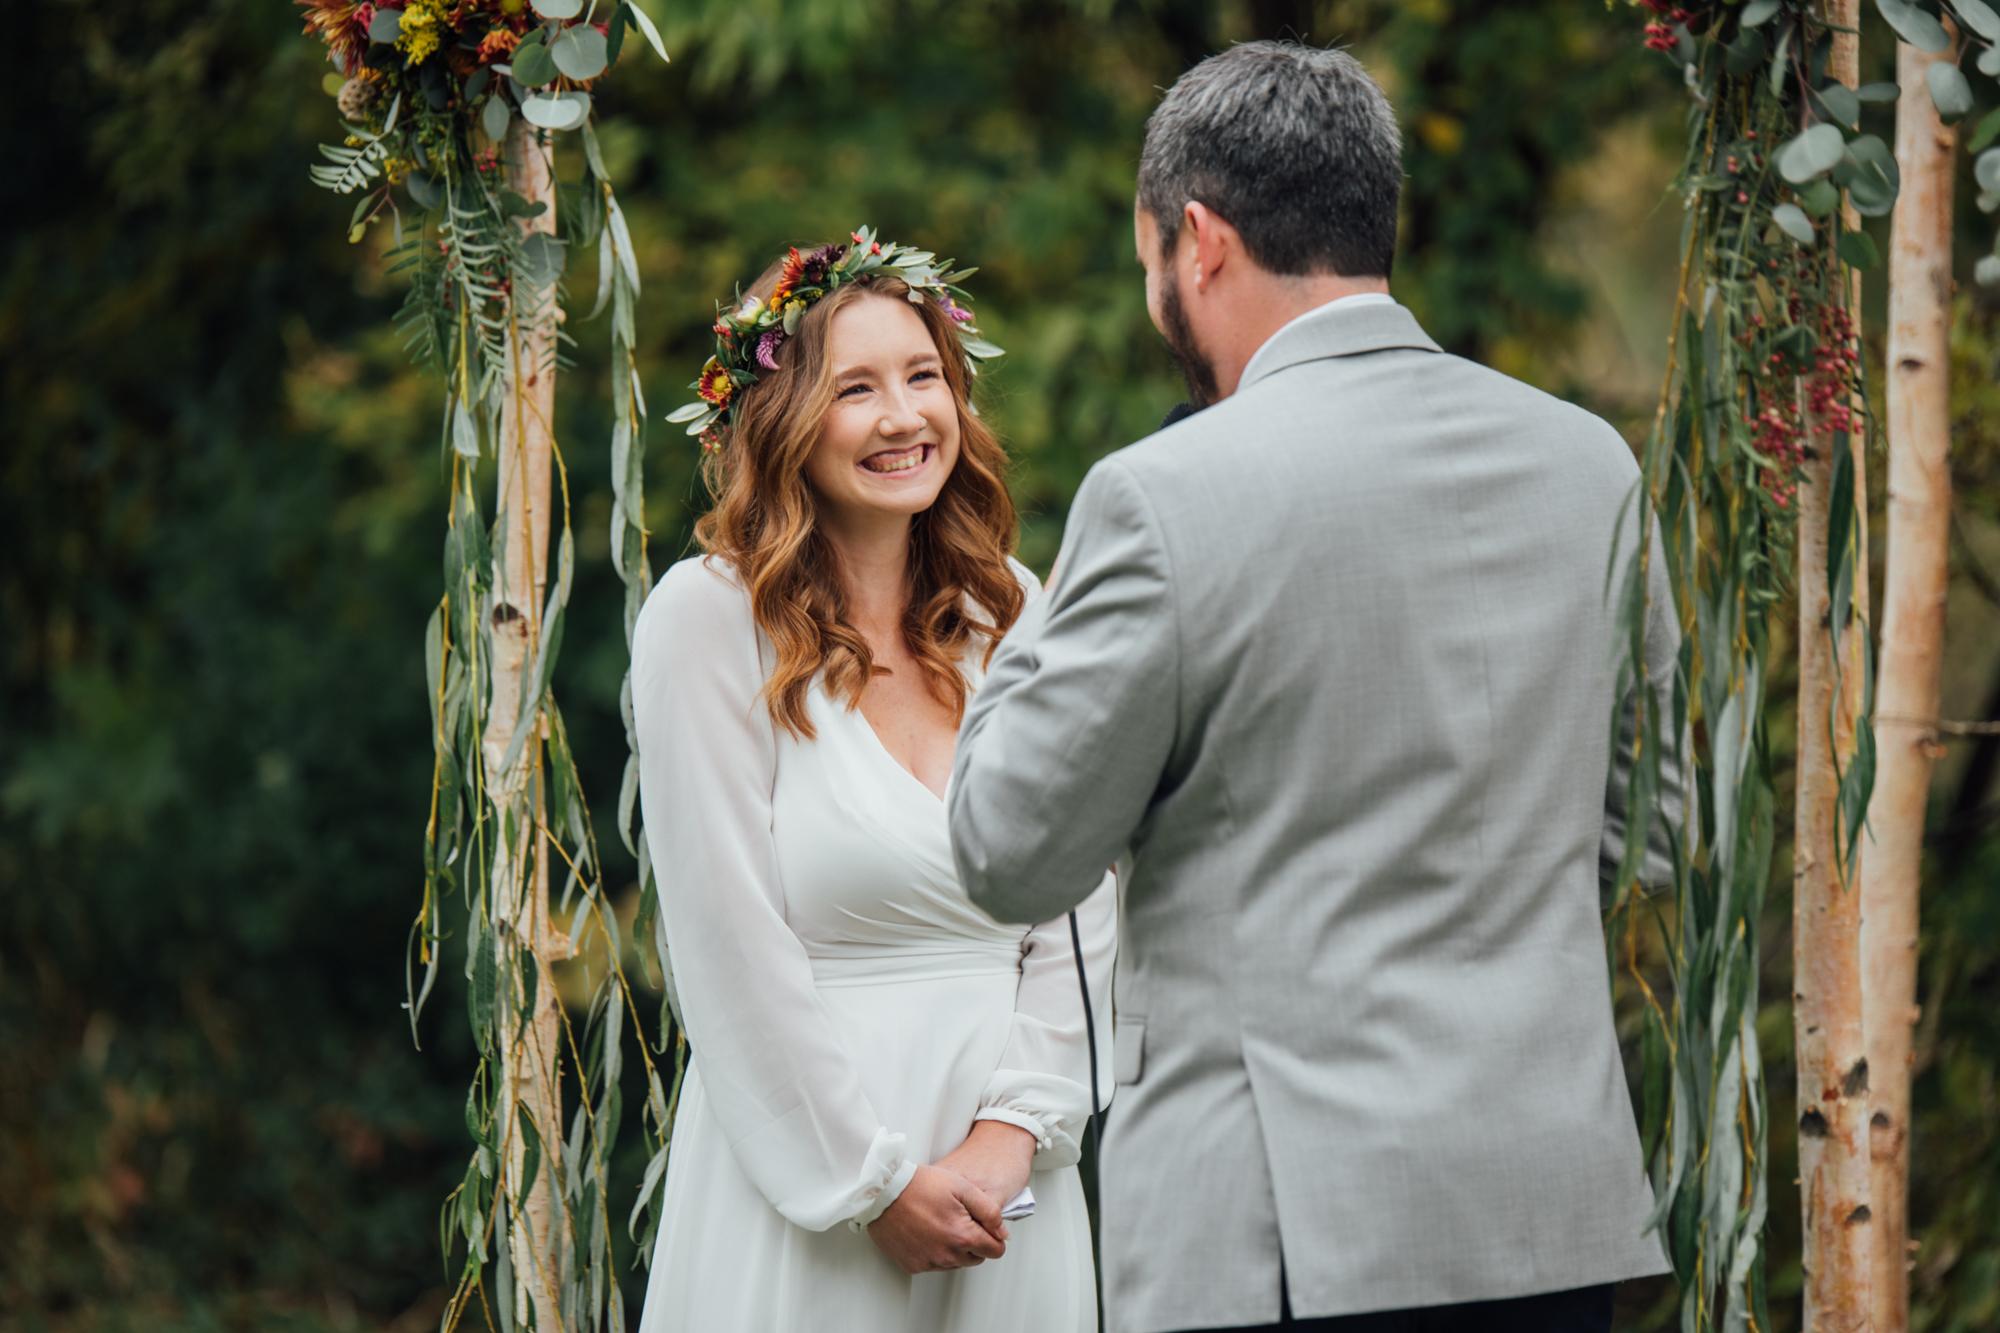 minneapolis-wedding-photographer-1-9.jpg